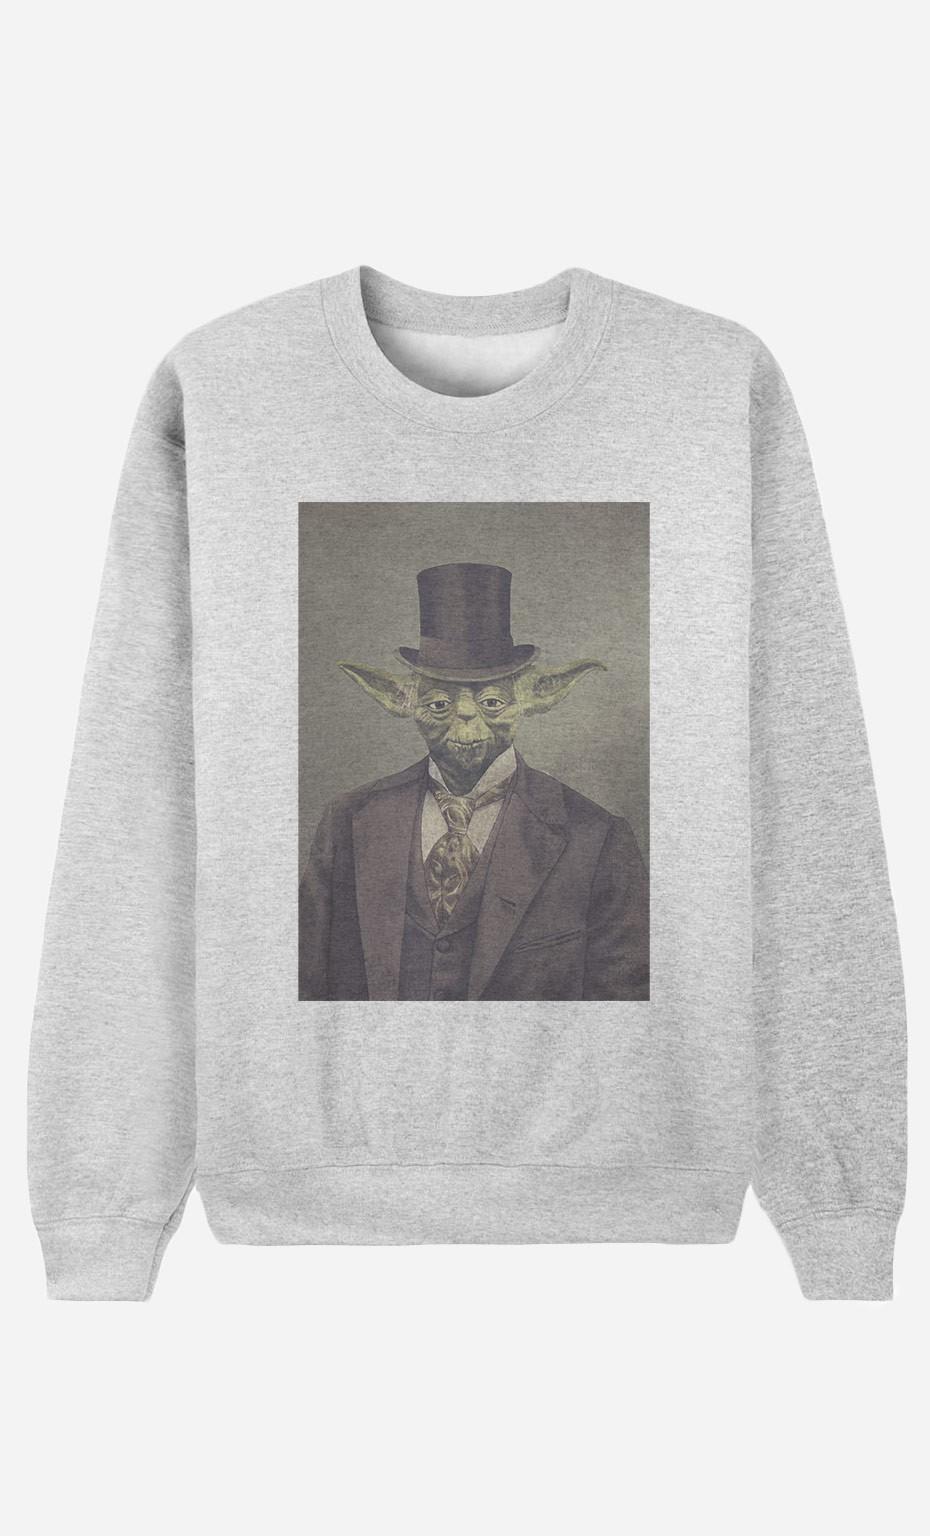 Sweatshirt Sir Yoda